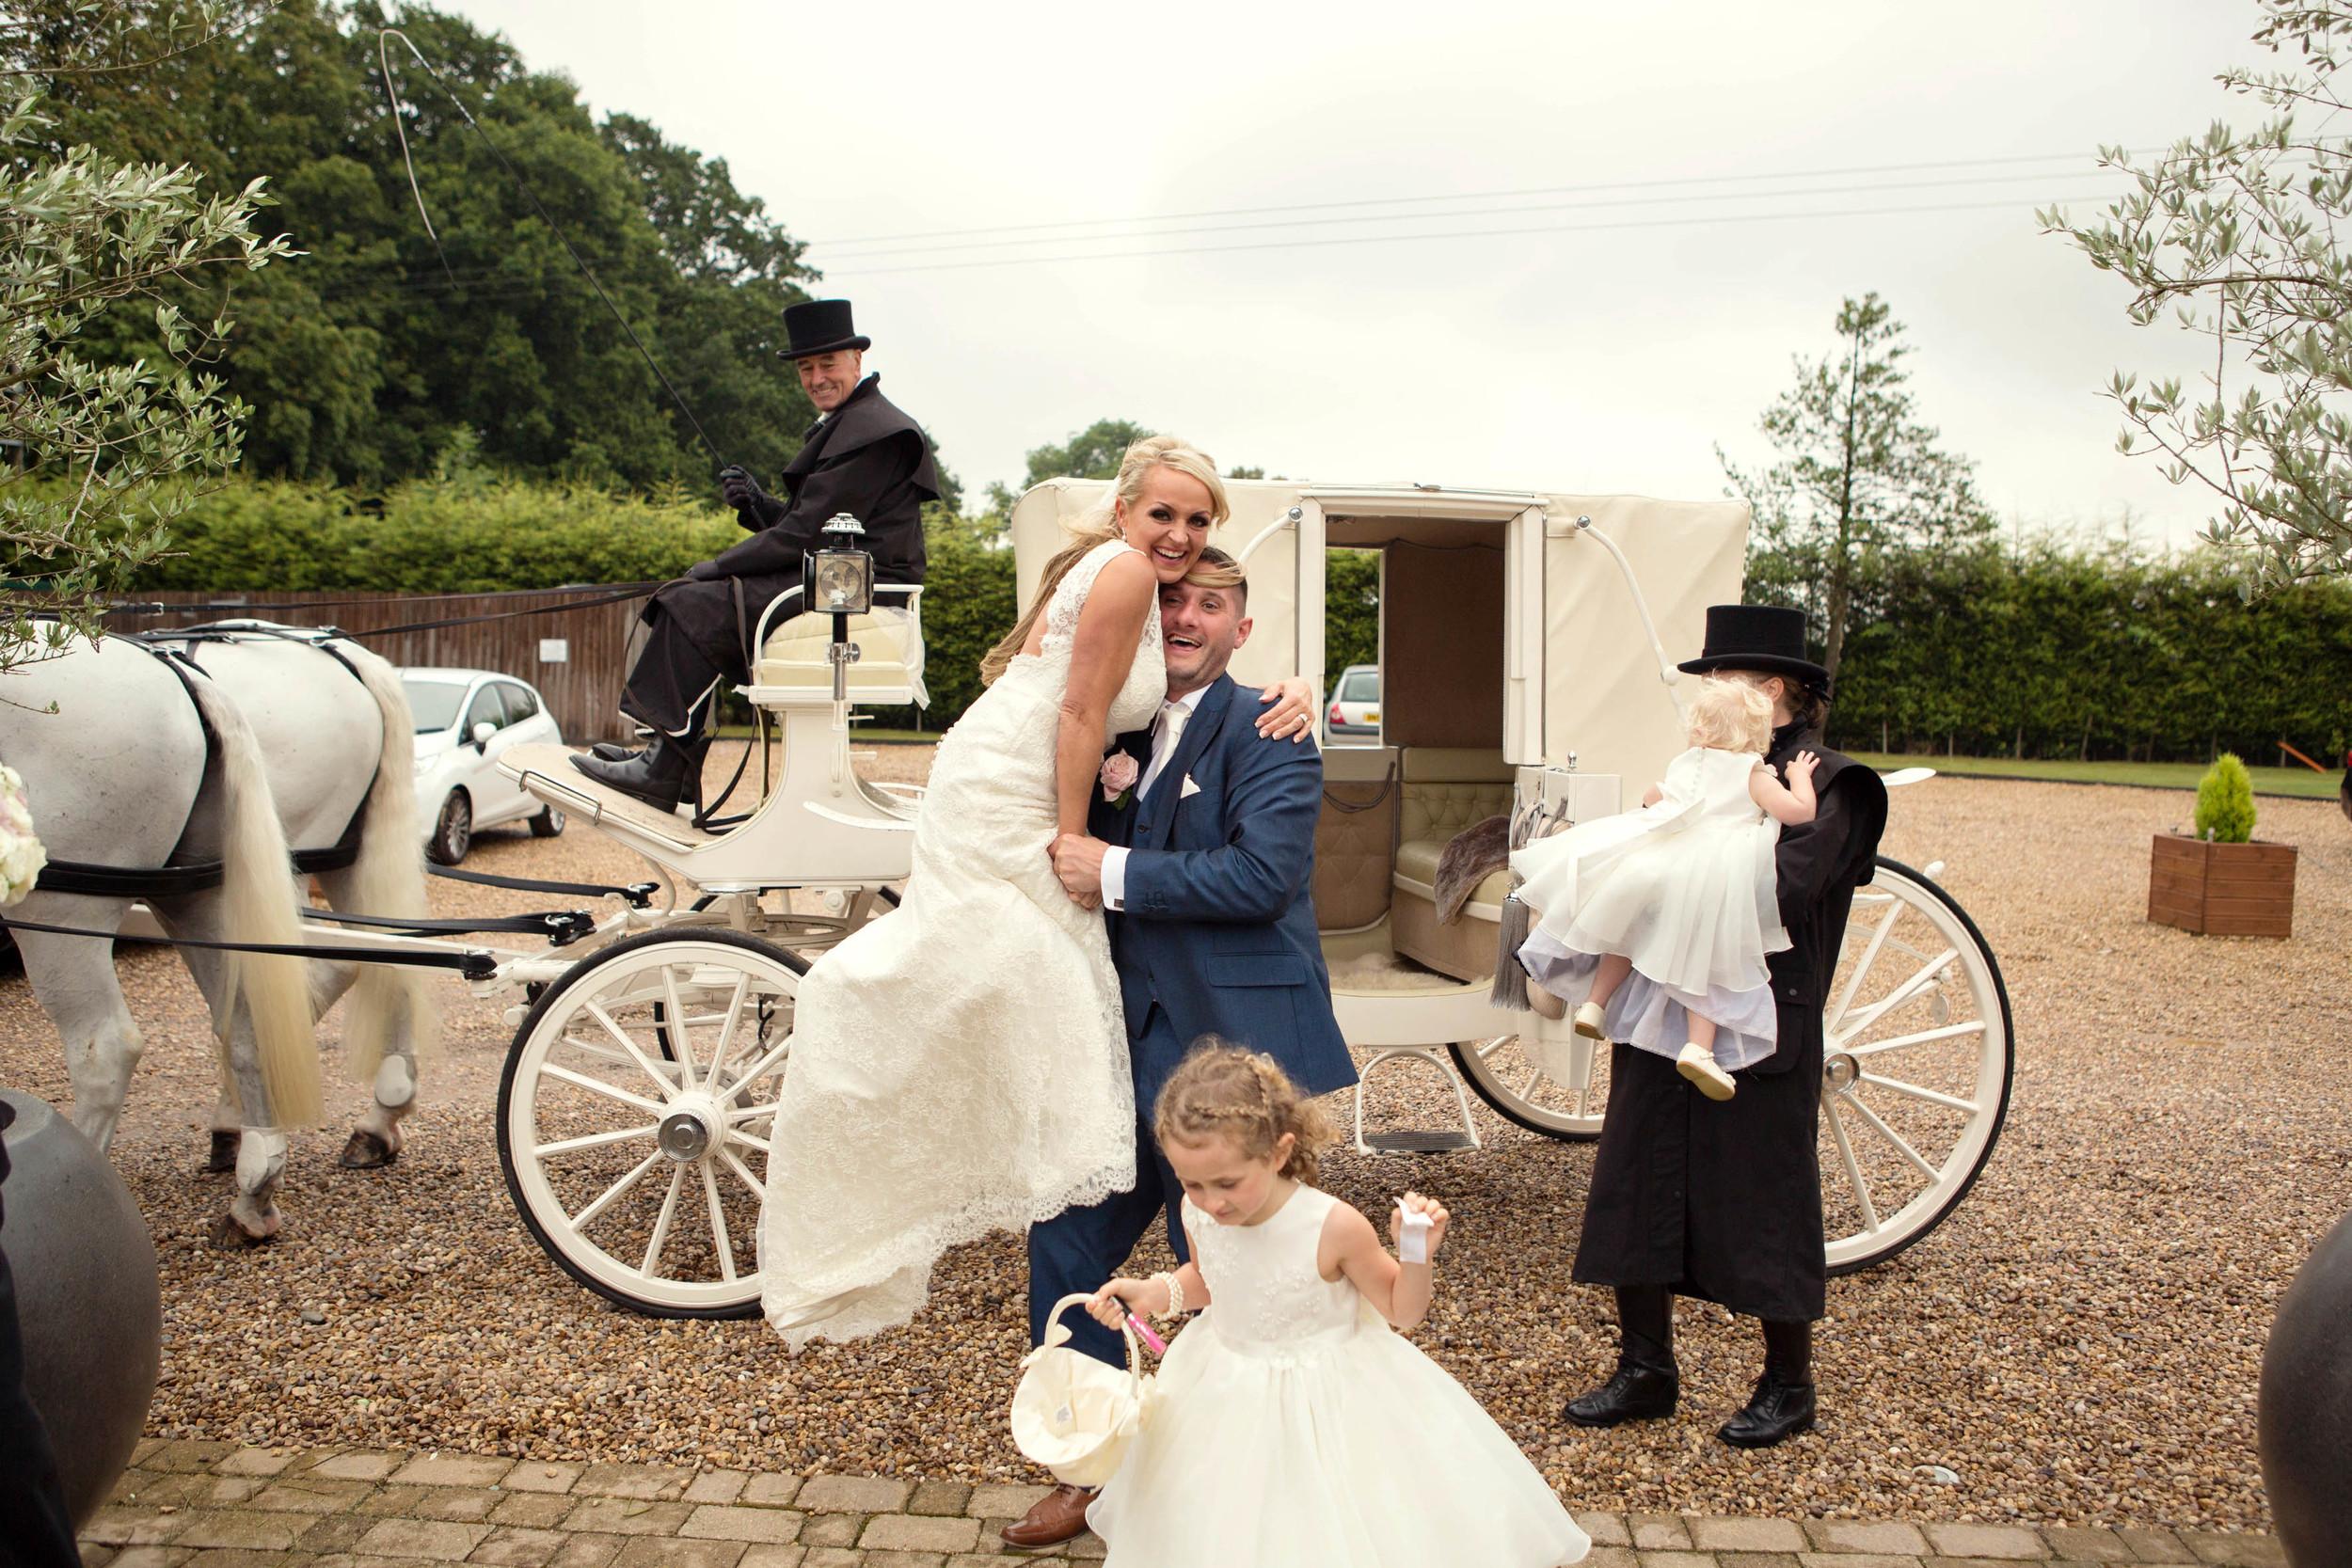 064 Michelle & Si, Hogarths Hotel, Sophie Evans Photography.jpg